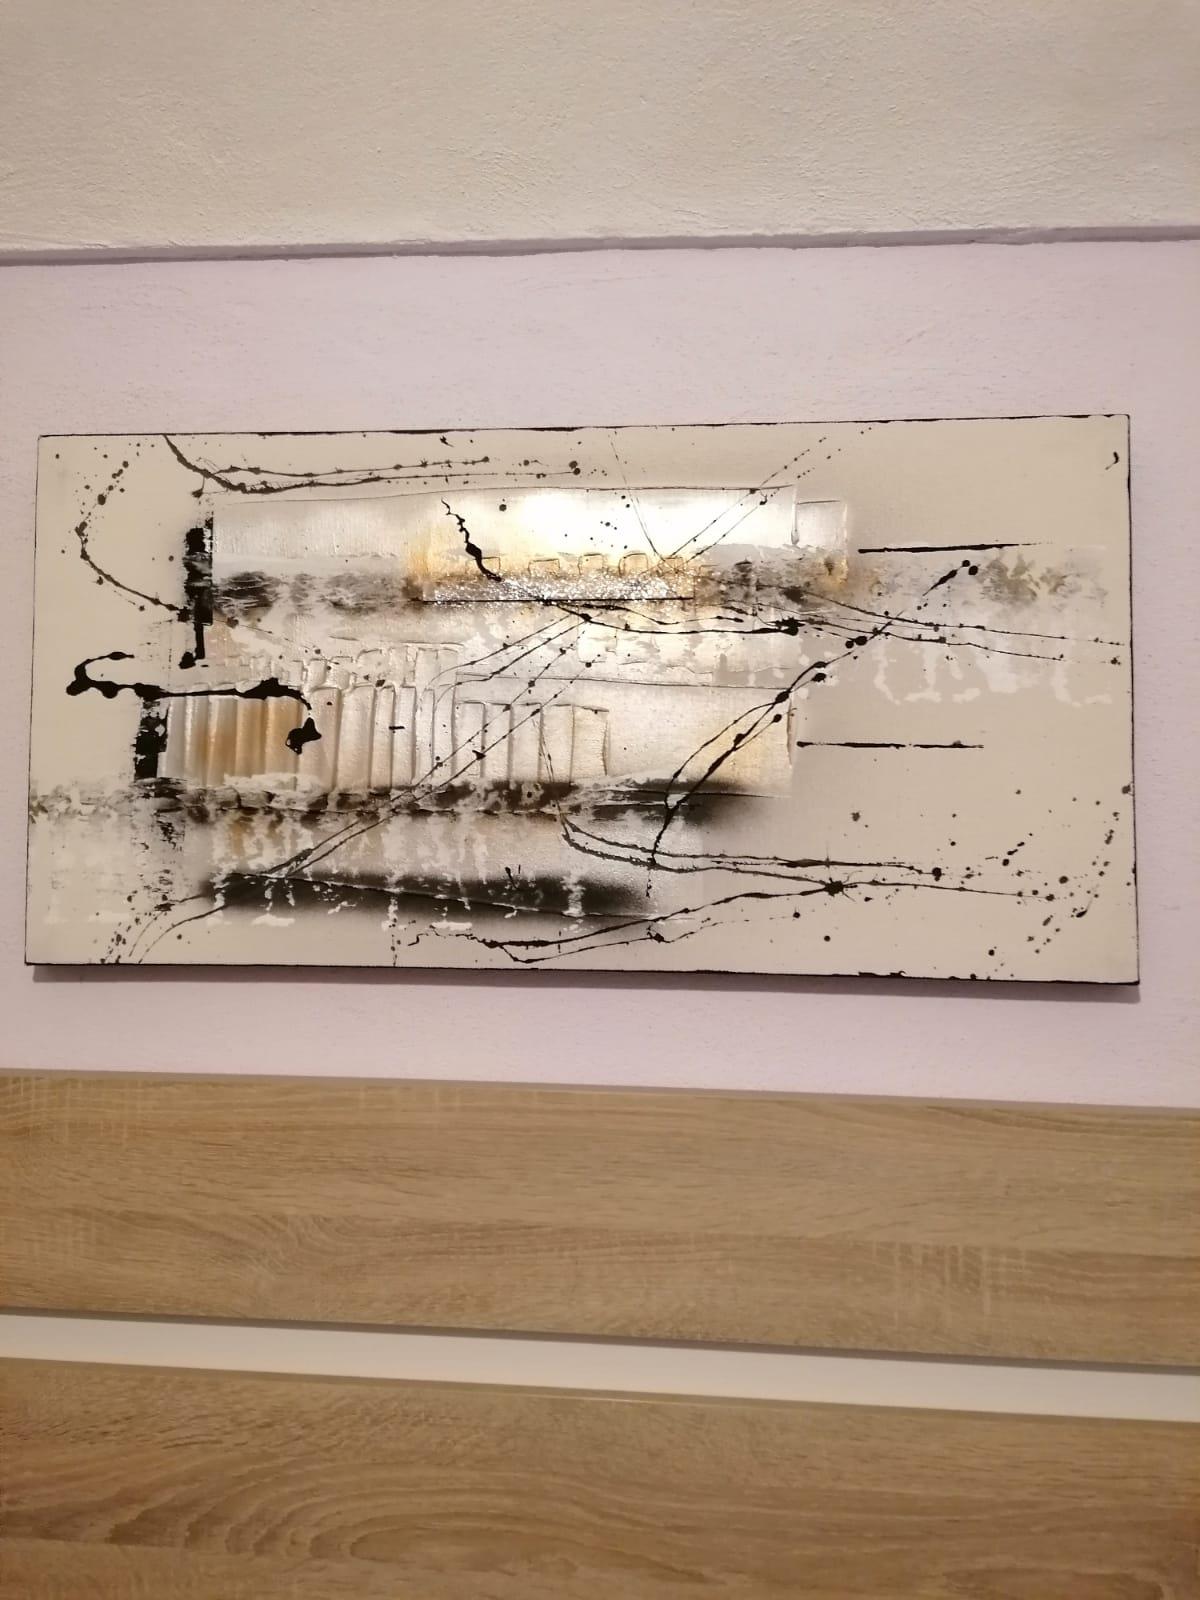 2.-RECTÁNGULO ARTÍSTICO. Iker G. M.